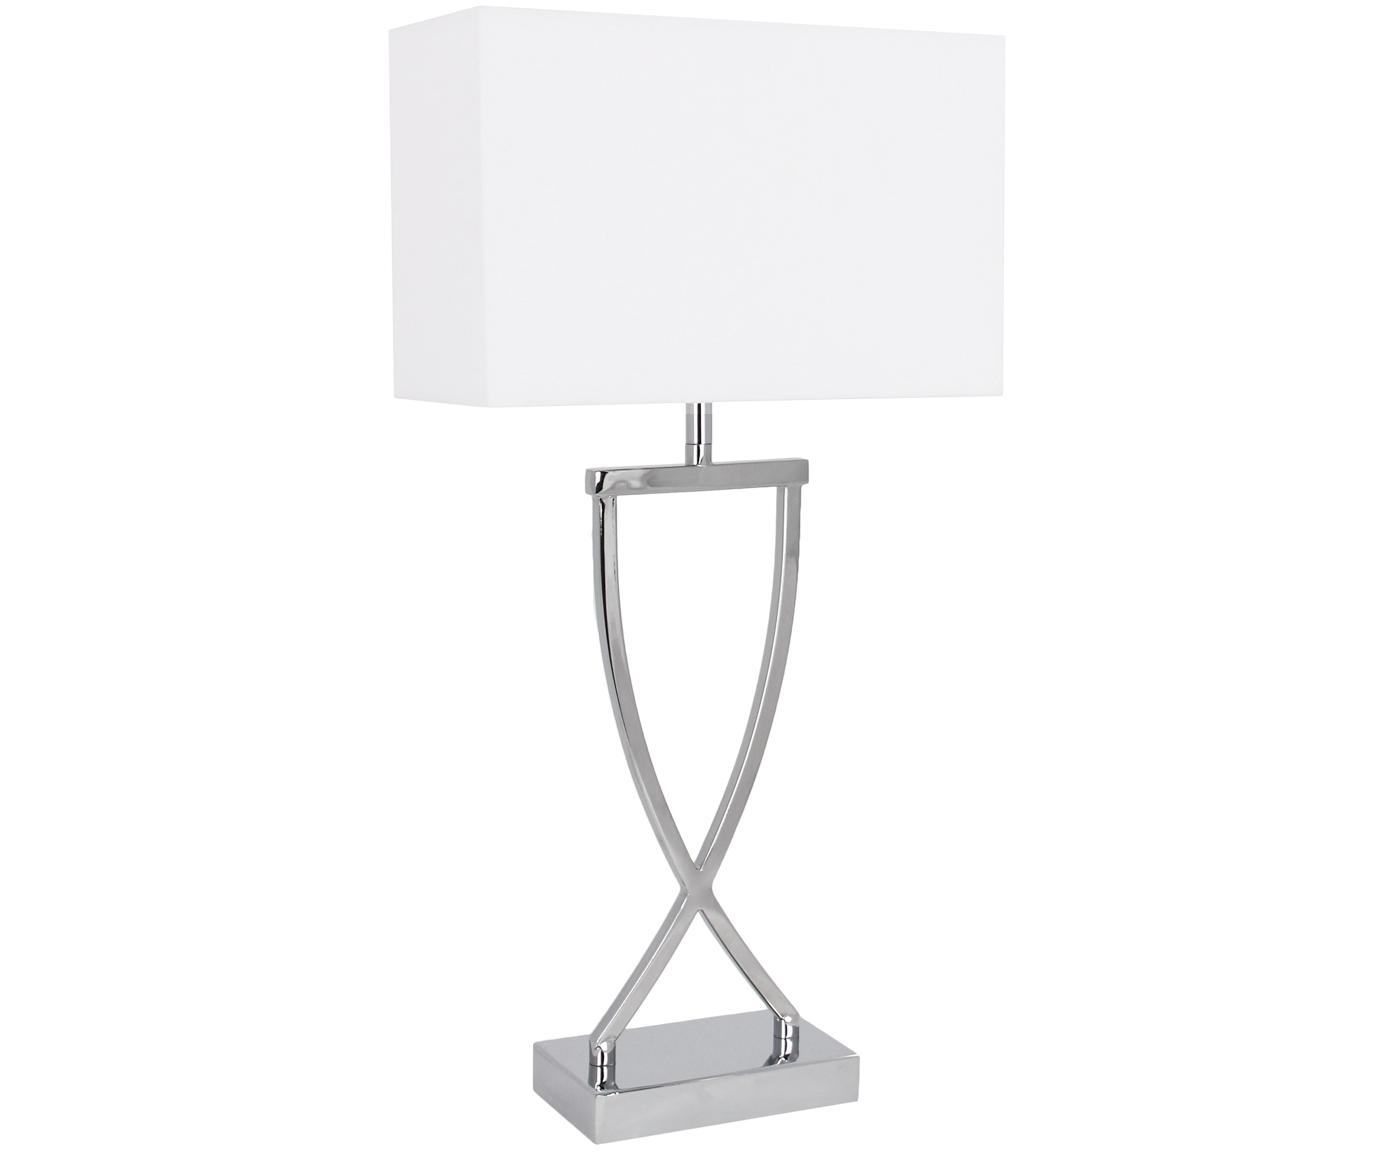 Lámpara de mesa Vanessa, Pantalla: tela, Cromo, blanco, An 27 x Al 52 cm